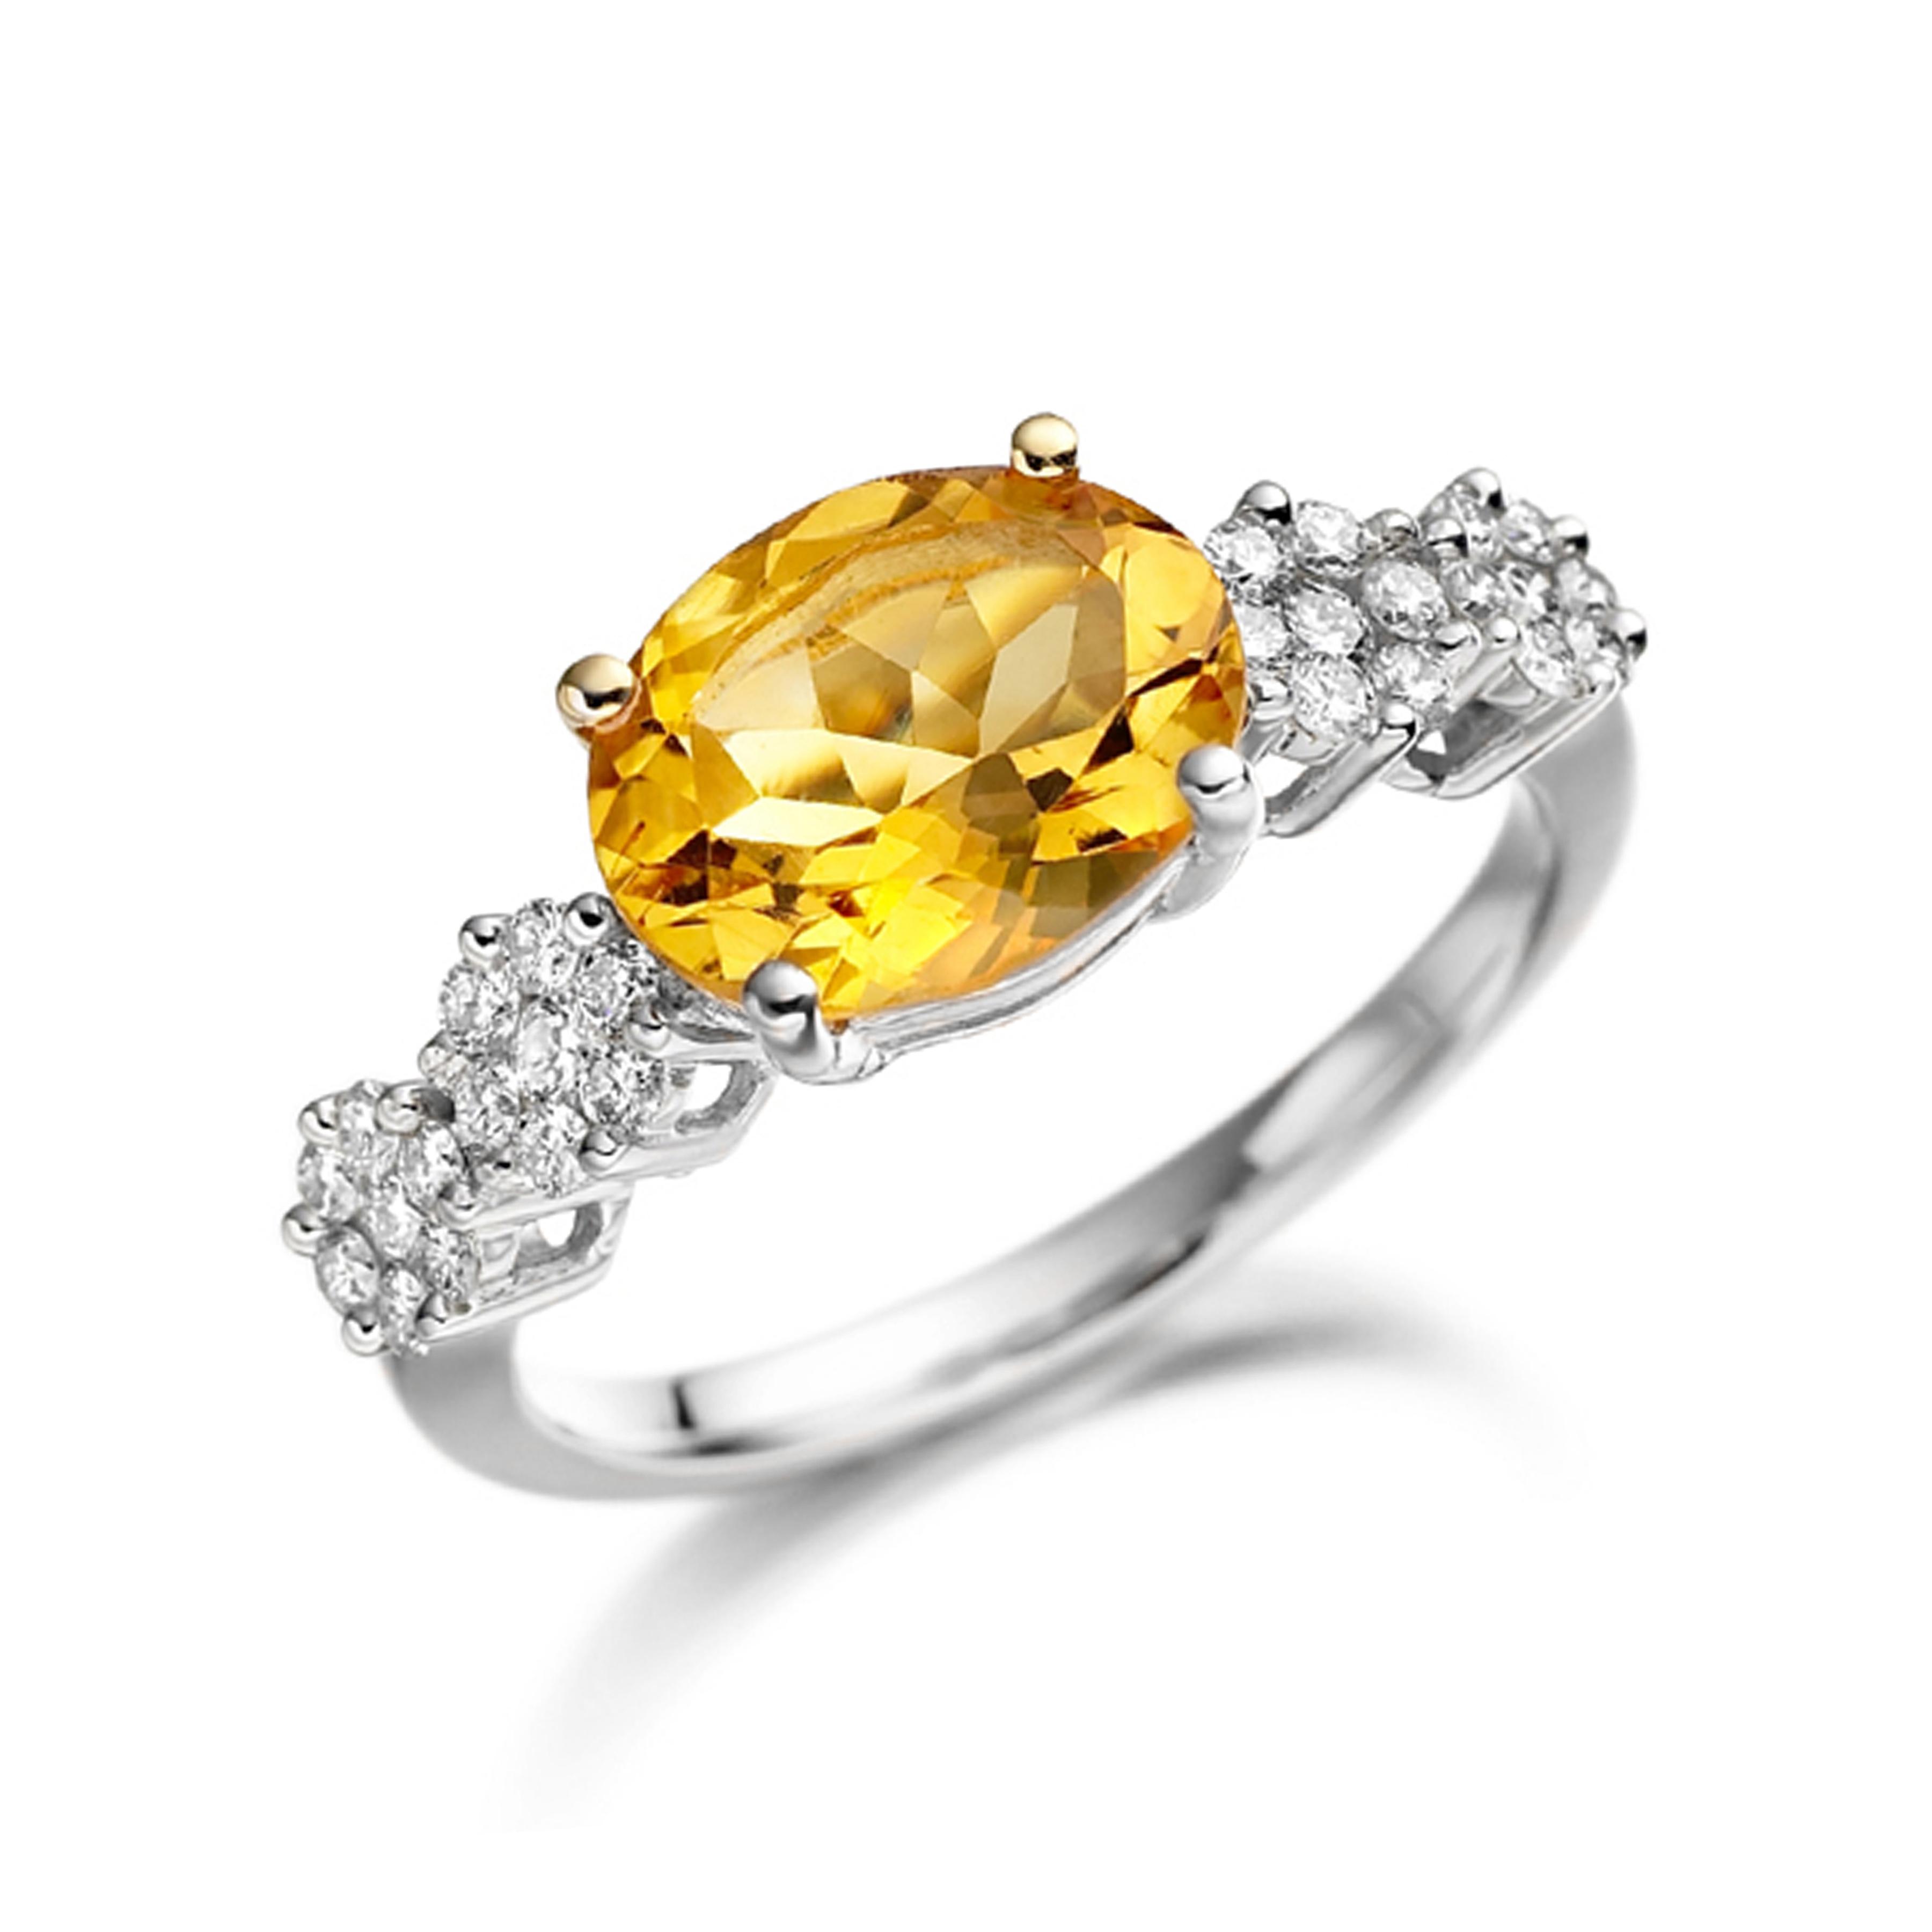 Prong Setting Round Shape Triangle Diamond Stud Earrings  (4.00mm X 6.20mm)